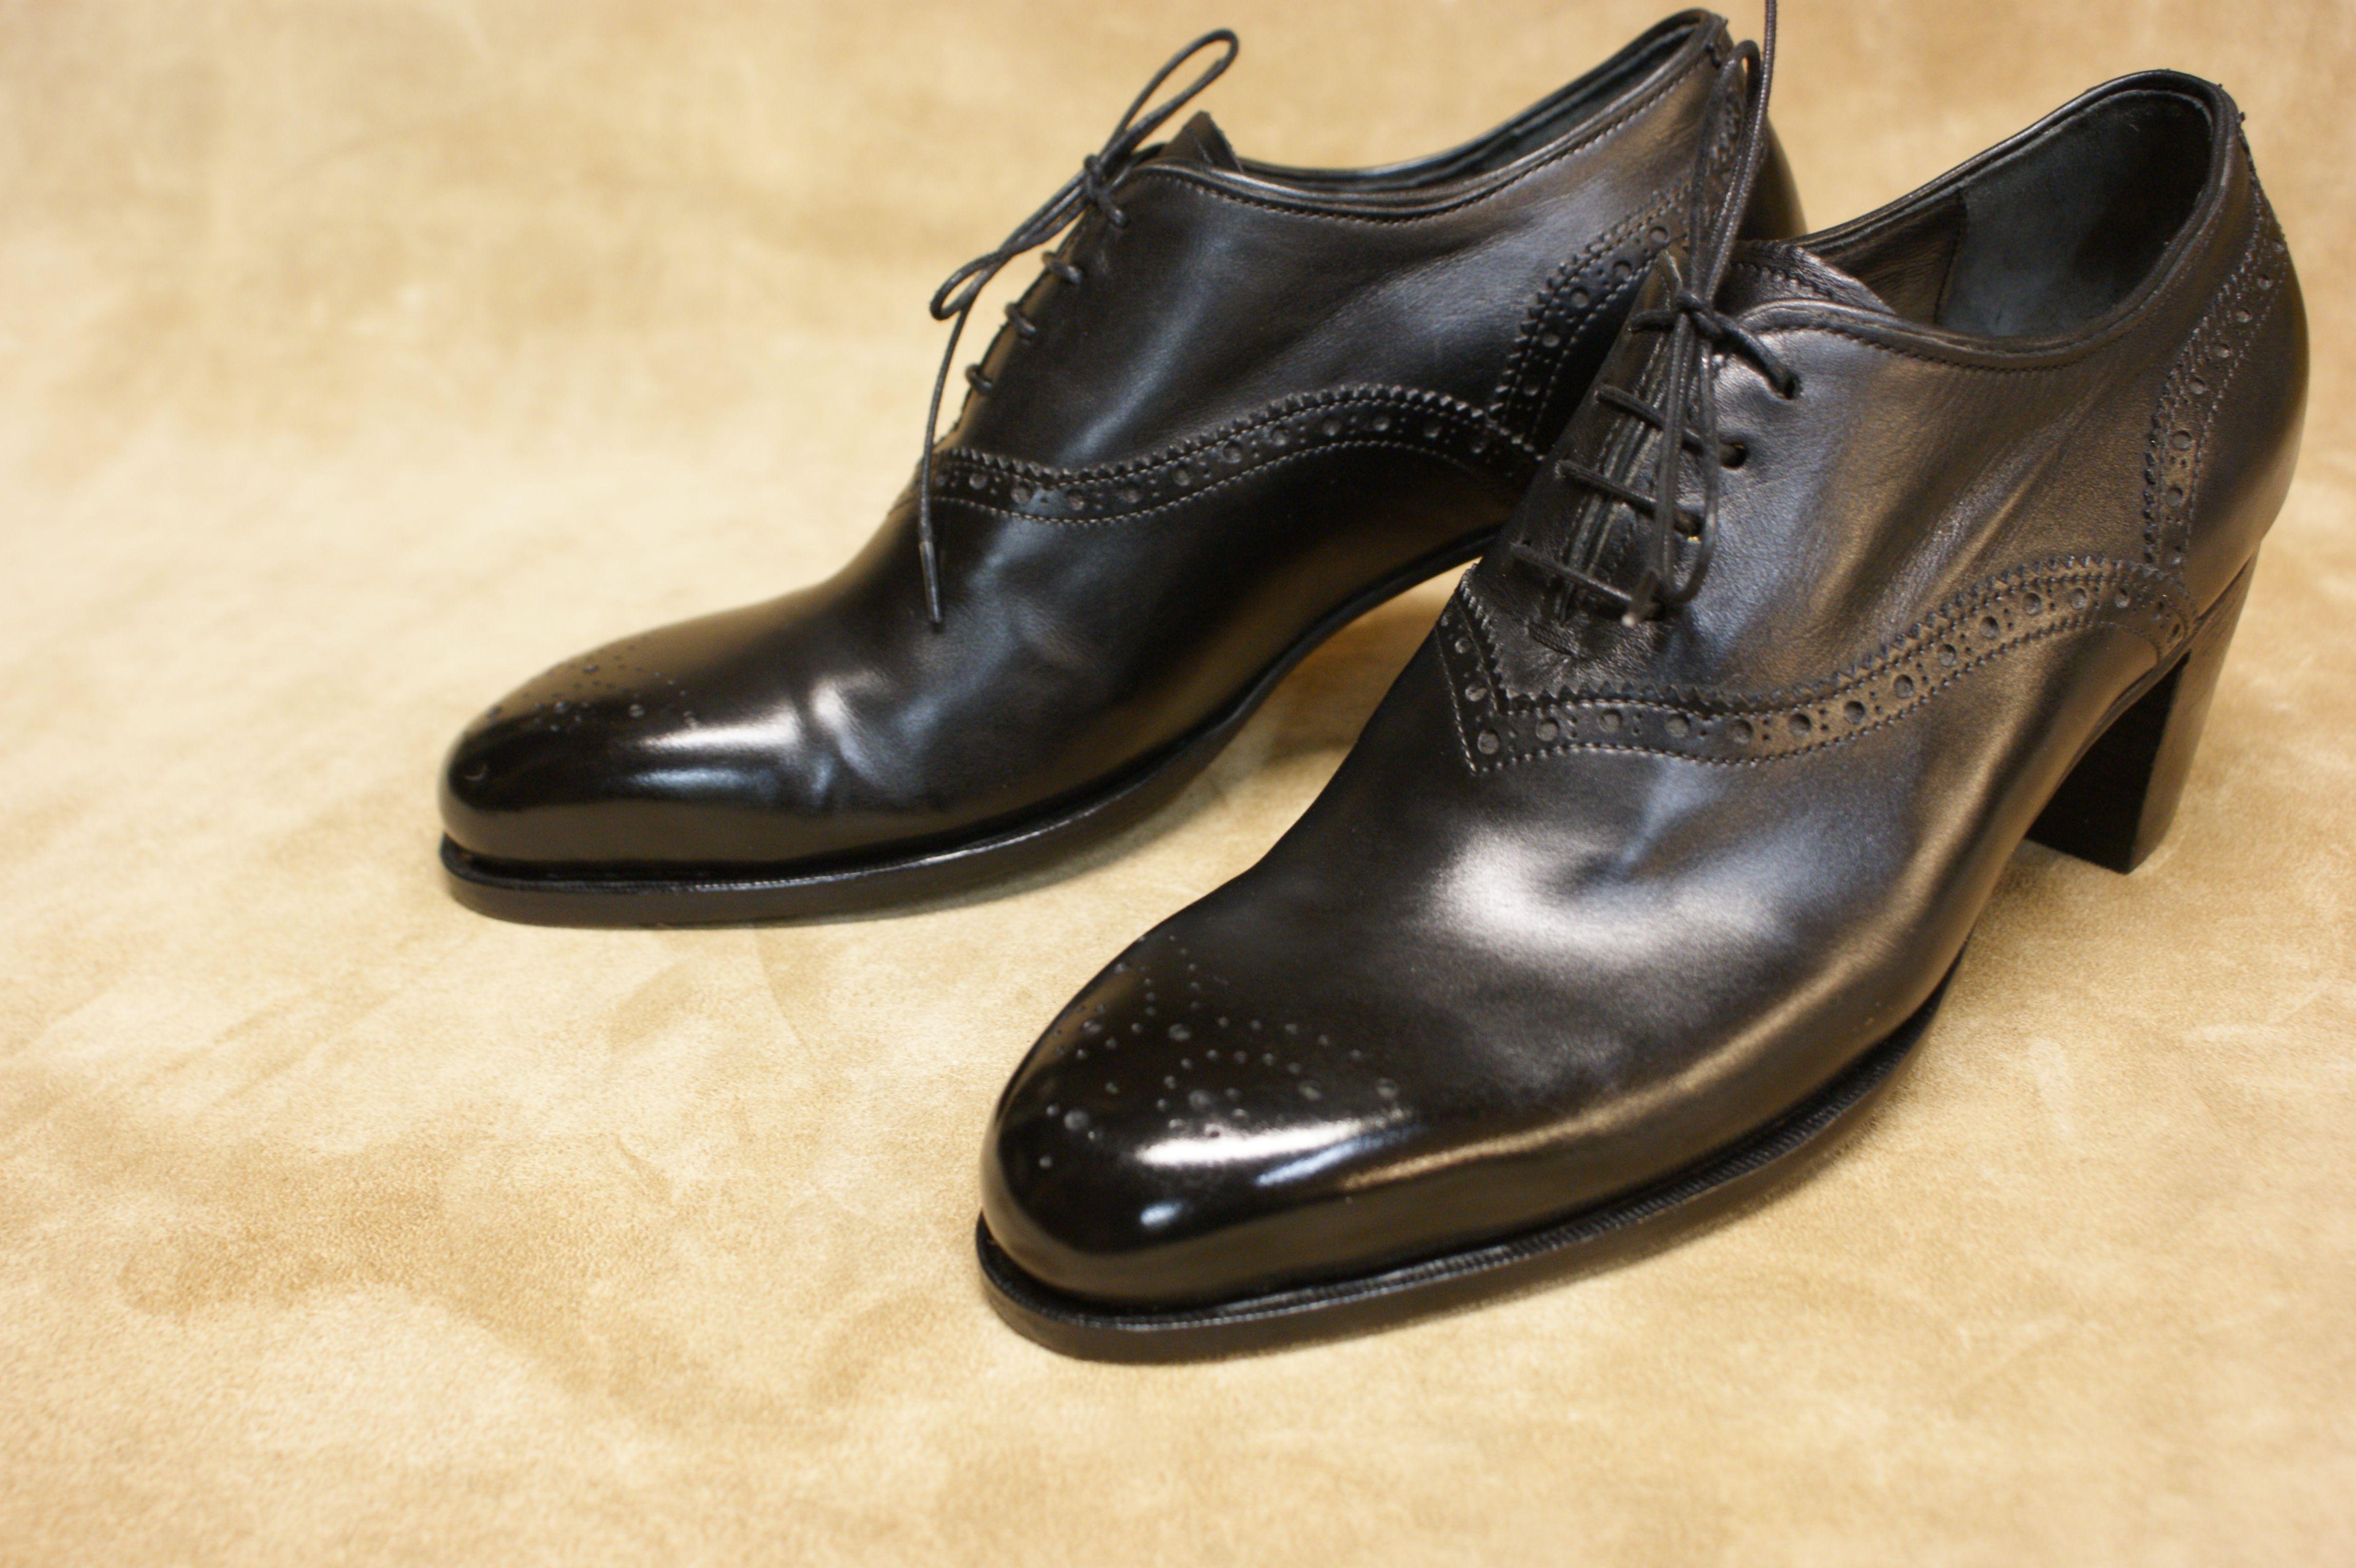 Schwarze #Schnürpumps, Damenschuhe nach Maß. Vickermann & Stoya #Maßschuhe aus #BadenBaden - Schuhmacher, Schuhreparaturen, Schuhmanufaktur